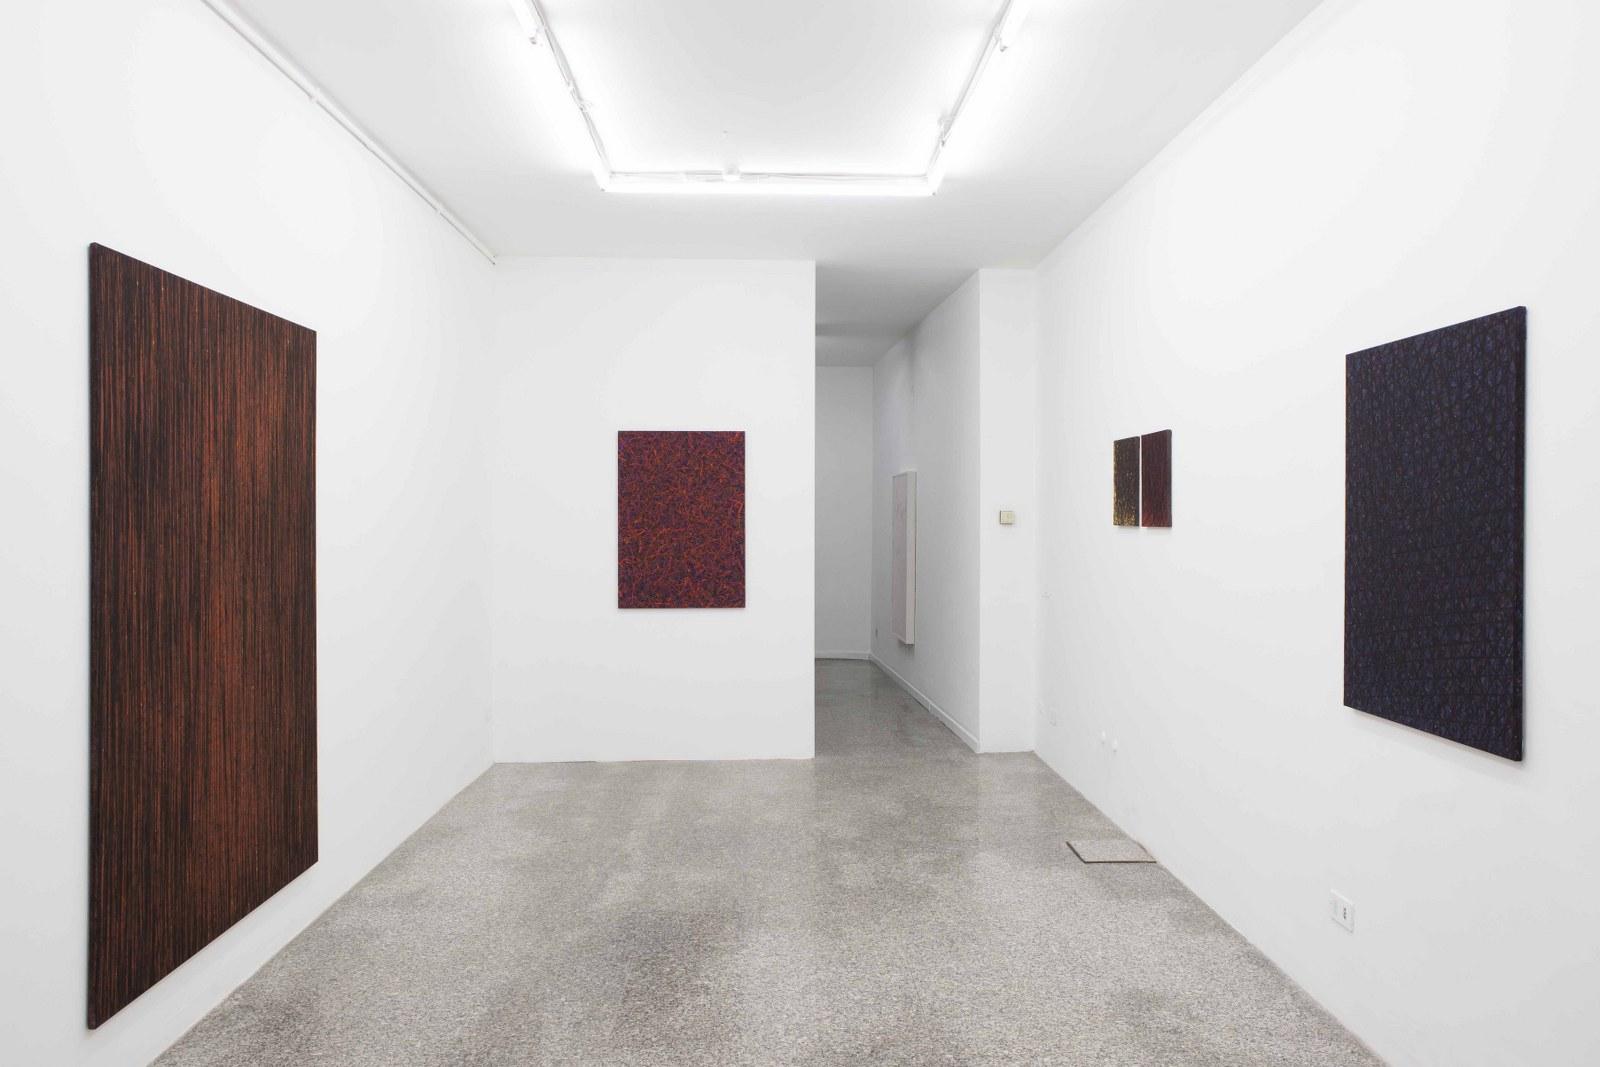 03 - exhibition view - Luca Macauda da A+B, Brescia 2015 - foto Davide Sala_1600x1067